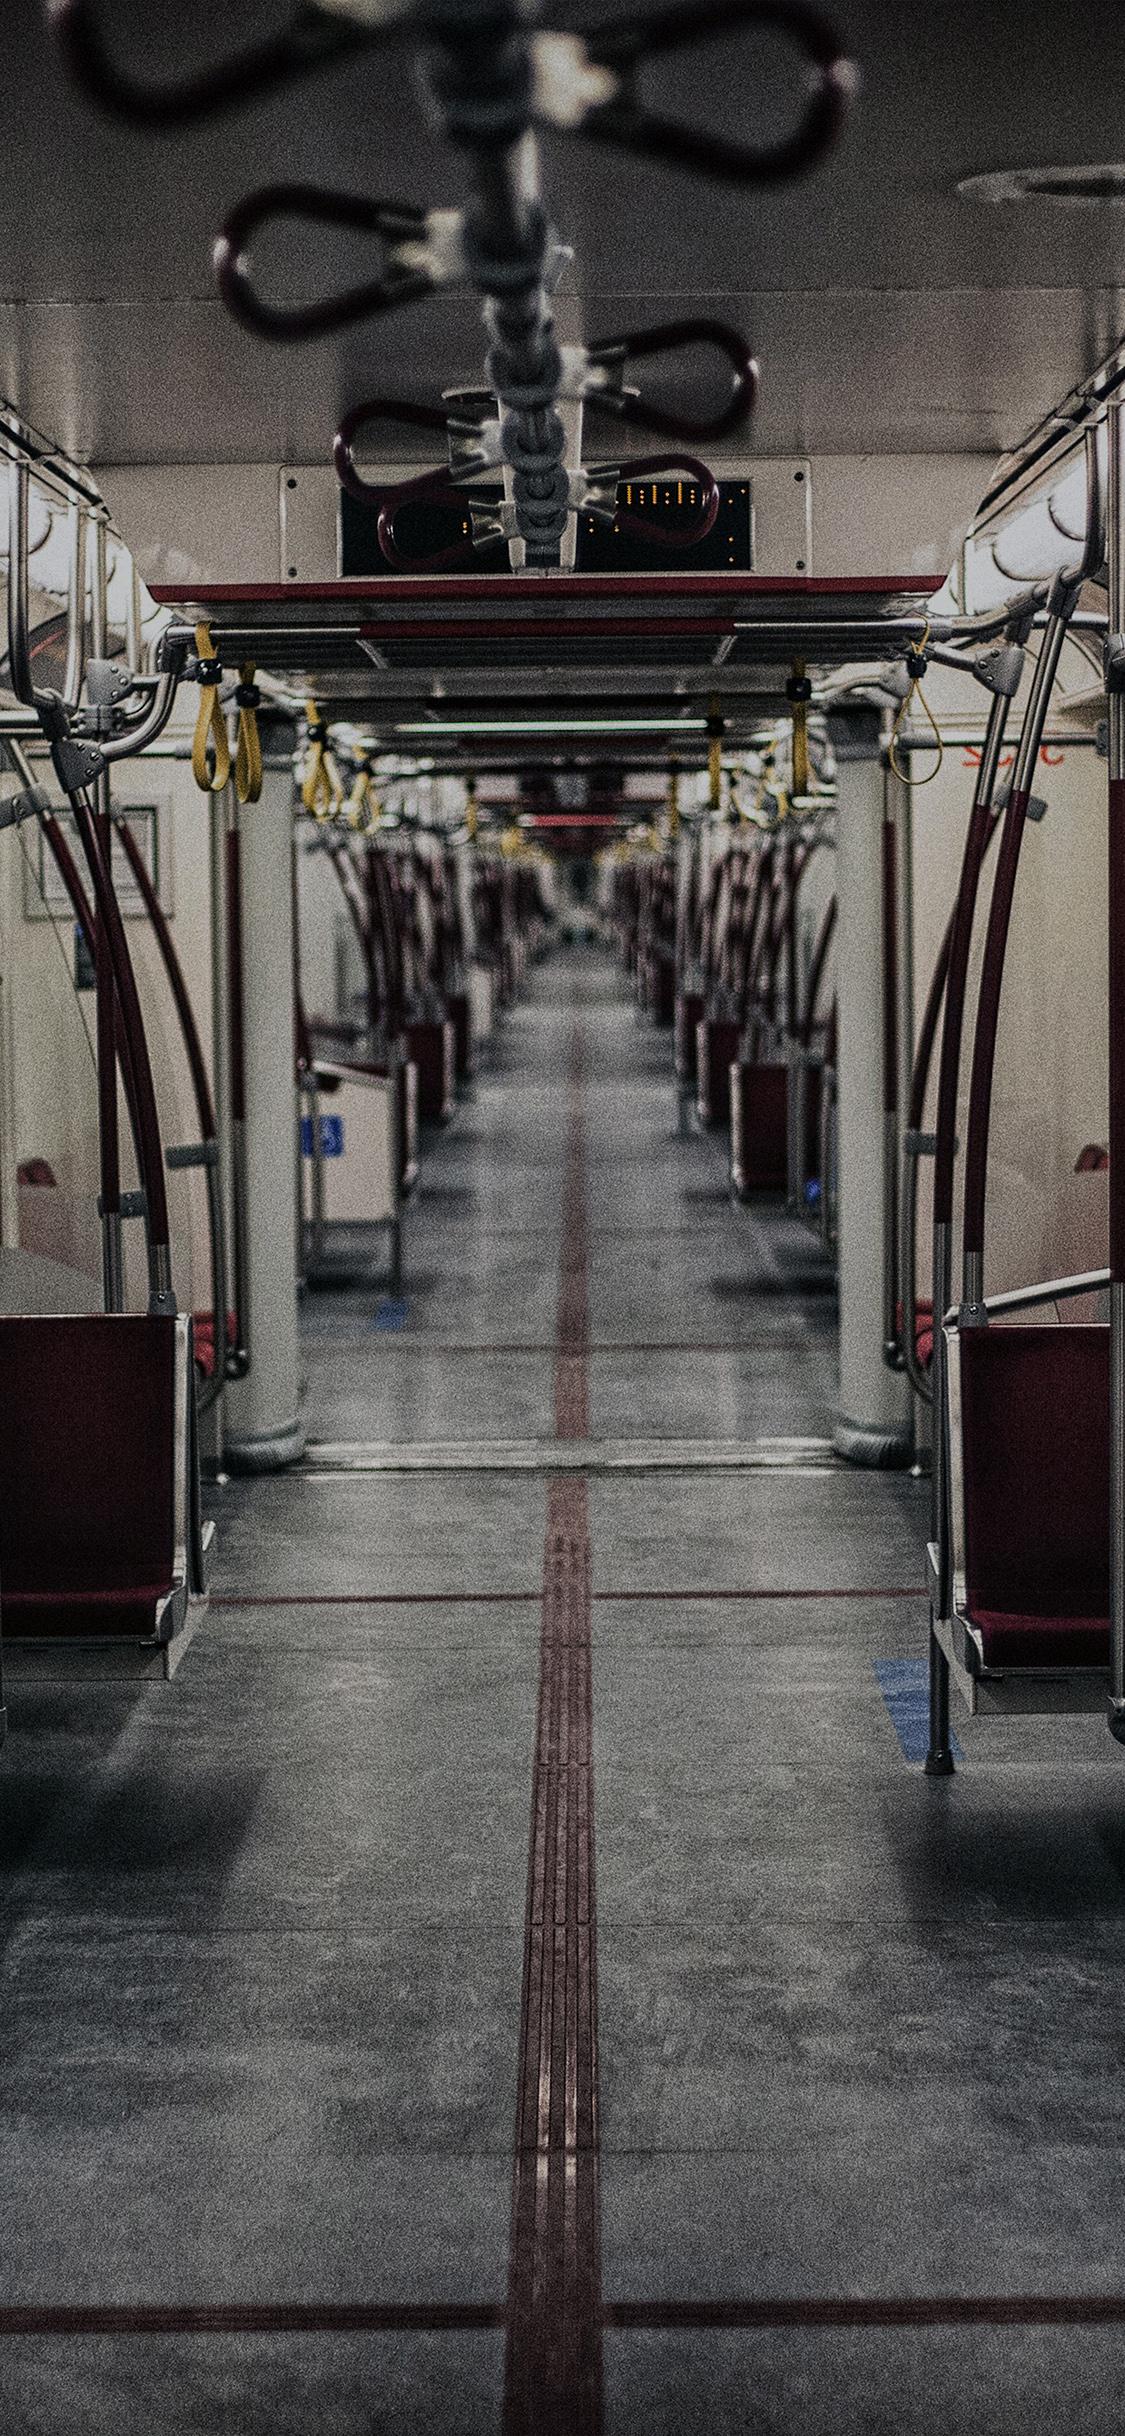 iPhoneXpapers.com-Apple-iPhone-wallpaper-nd90-subway-city-train-dark